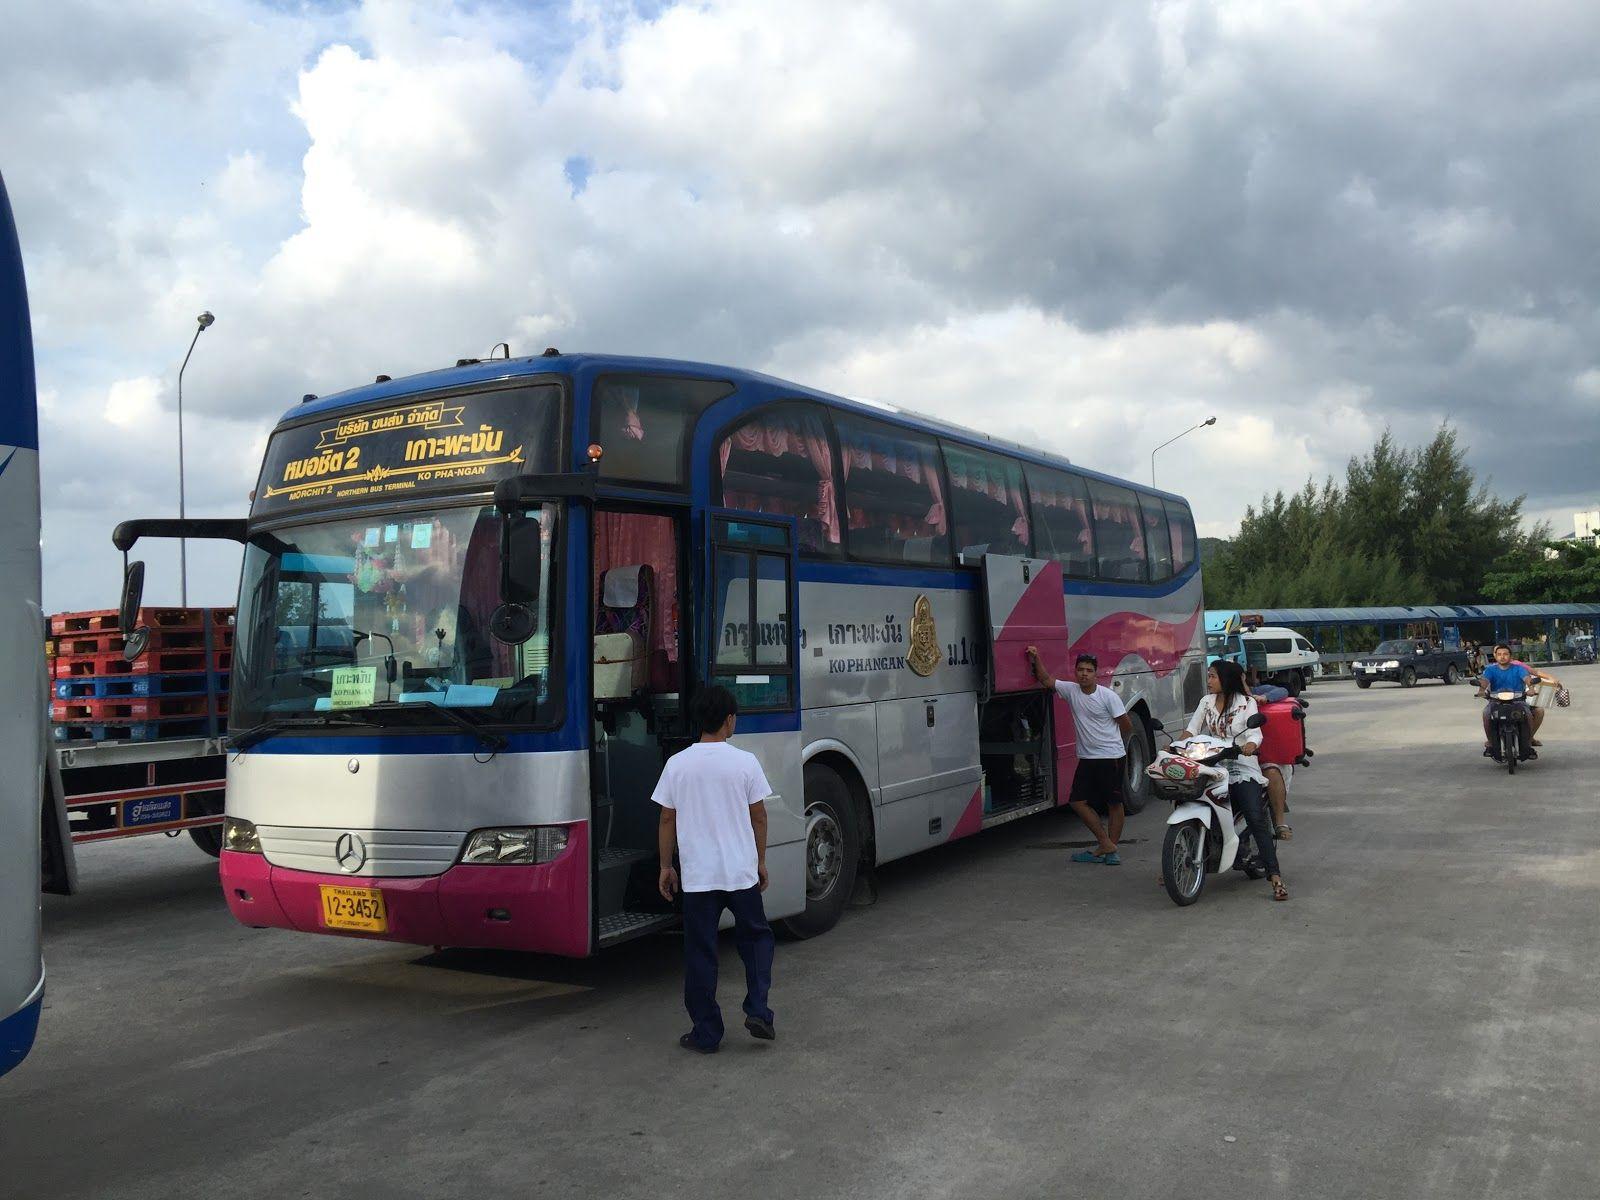 Turista Autobús + transbordador